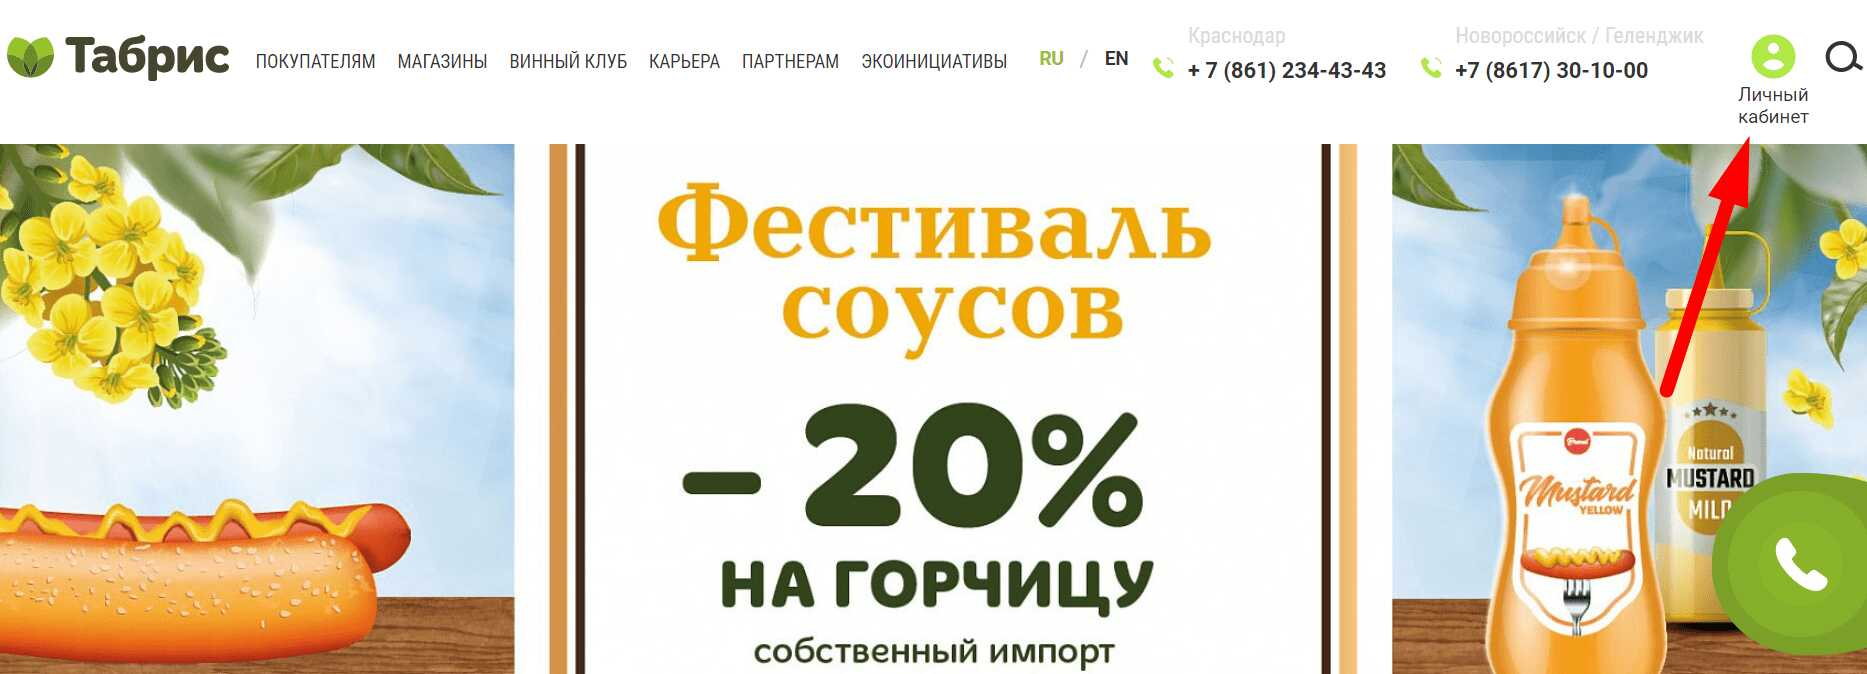 Ссылка на сайт сети супермаркетов «Табрис»